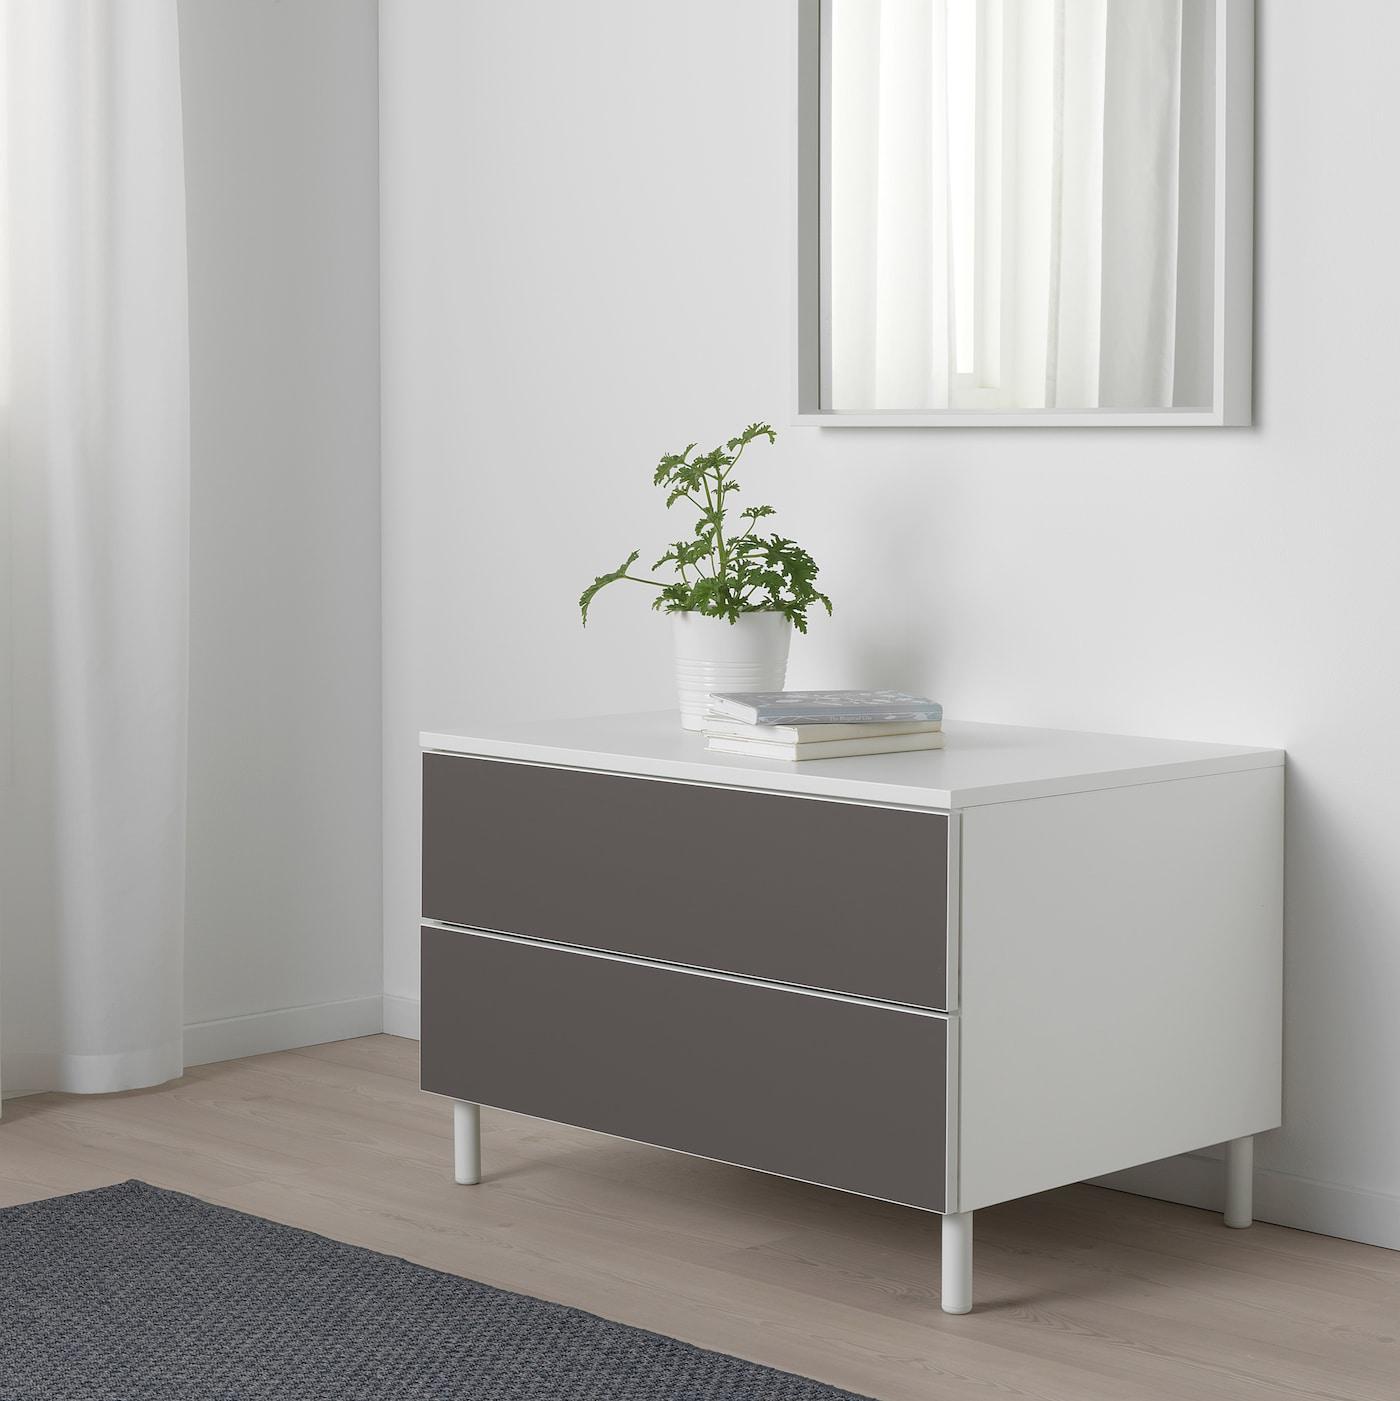 PLATSA Kommode mit 2 Schubladen weiß/Skatval dunkelgrau 80 cm 57 cm 53 cm